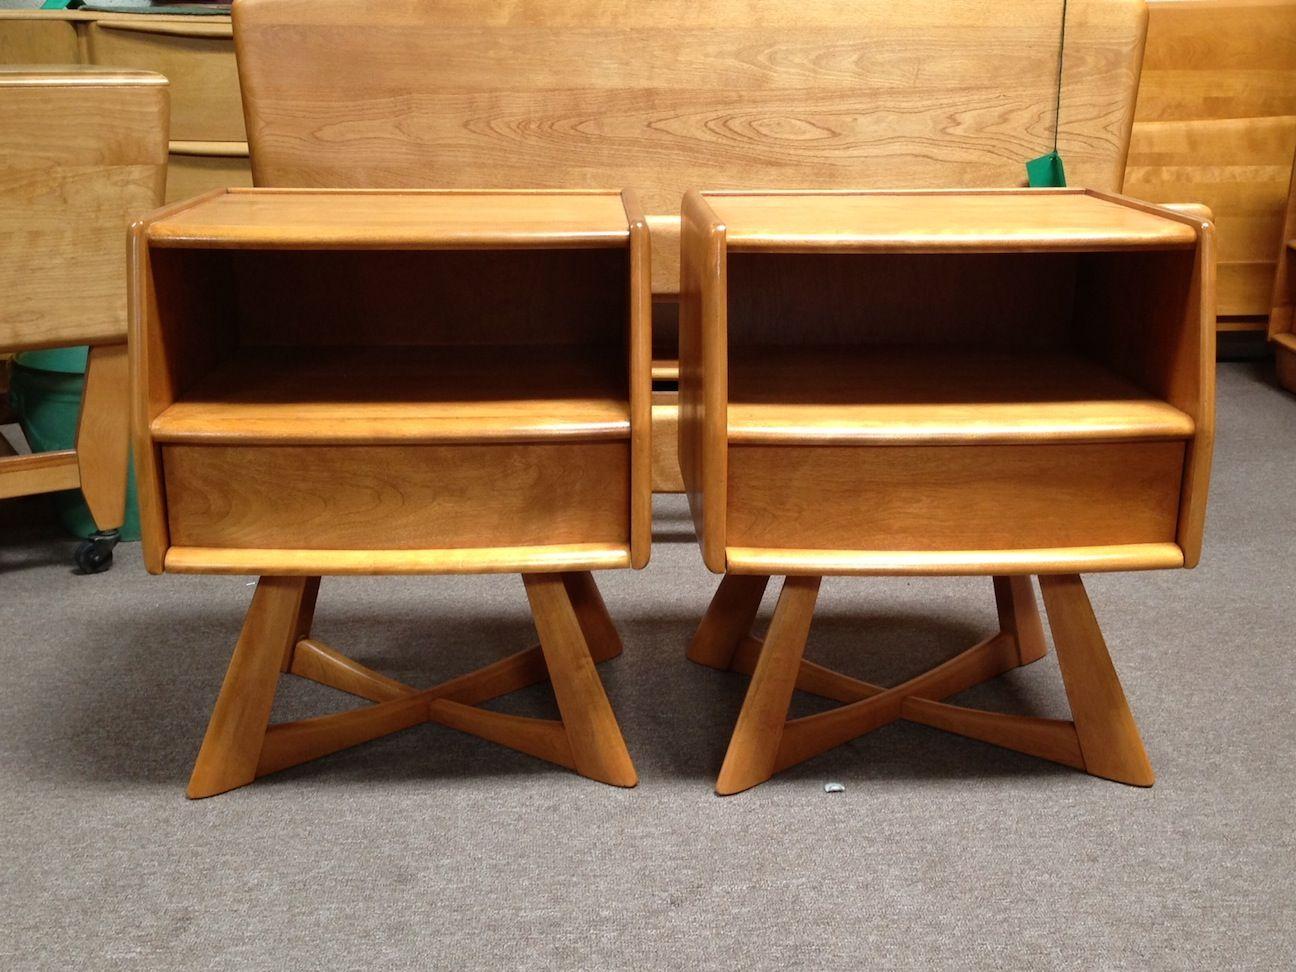 Pin By Vince Bravo On Heywood Wakefield Heywood Wakefield Furniture Wakefield Furniture Mod Furniture